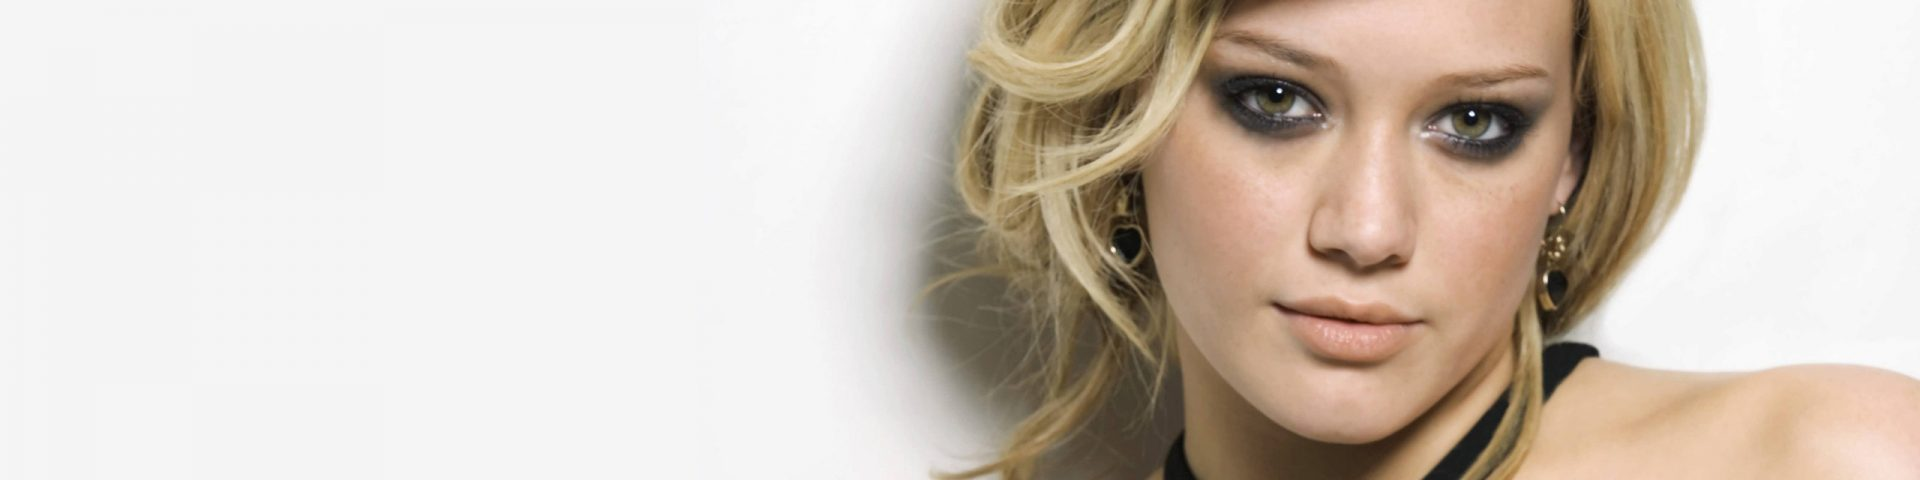 Disney: da Hilary Duff a Demi Lovato, una scuola di talenti - Video